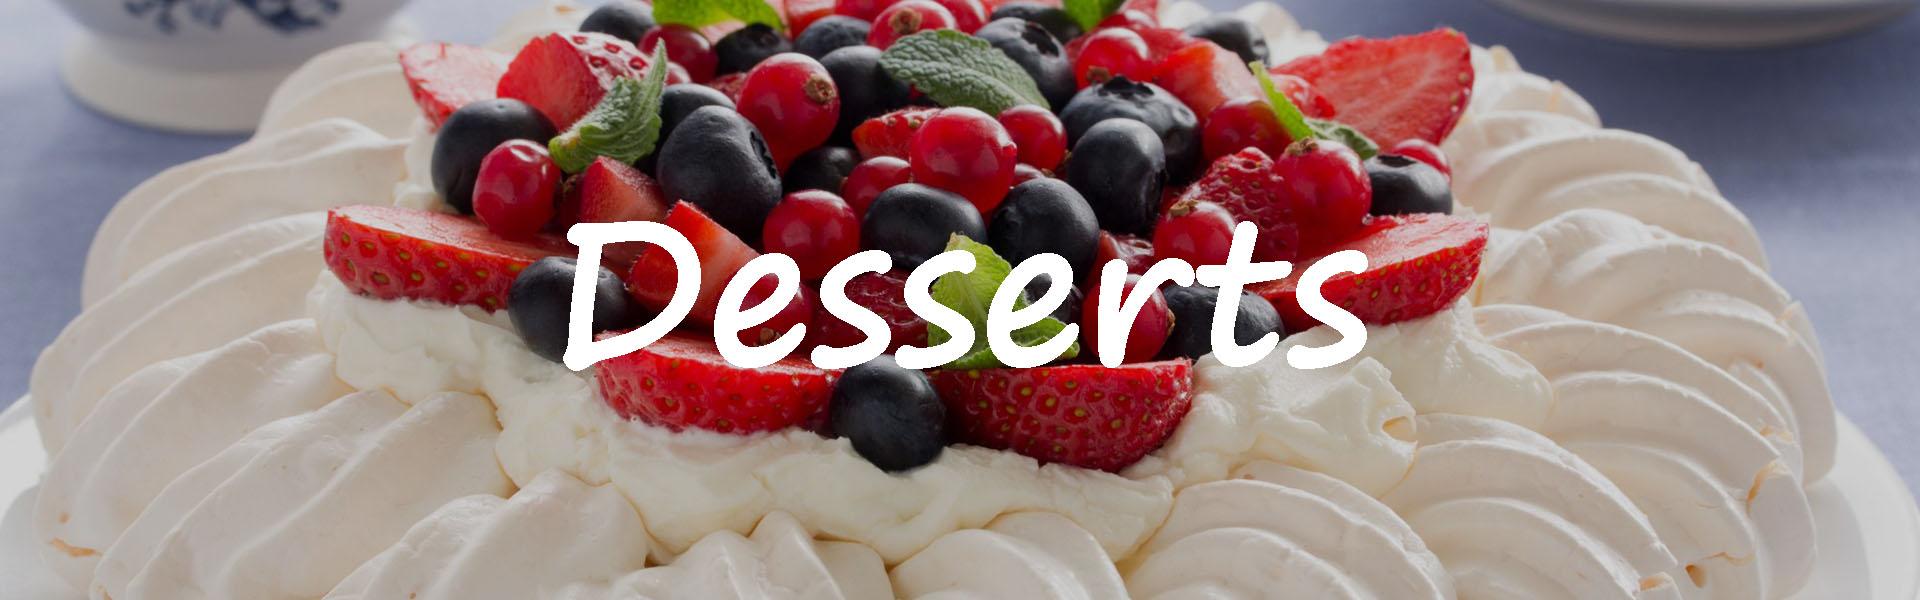 web-ready-desserts-2